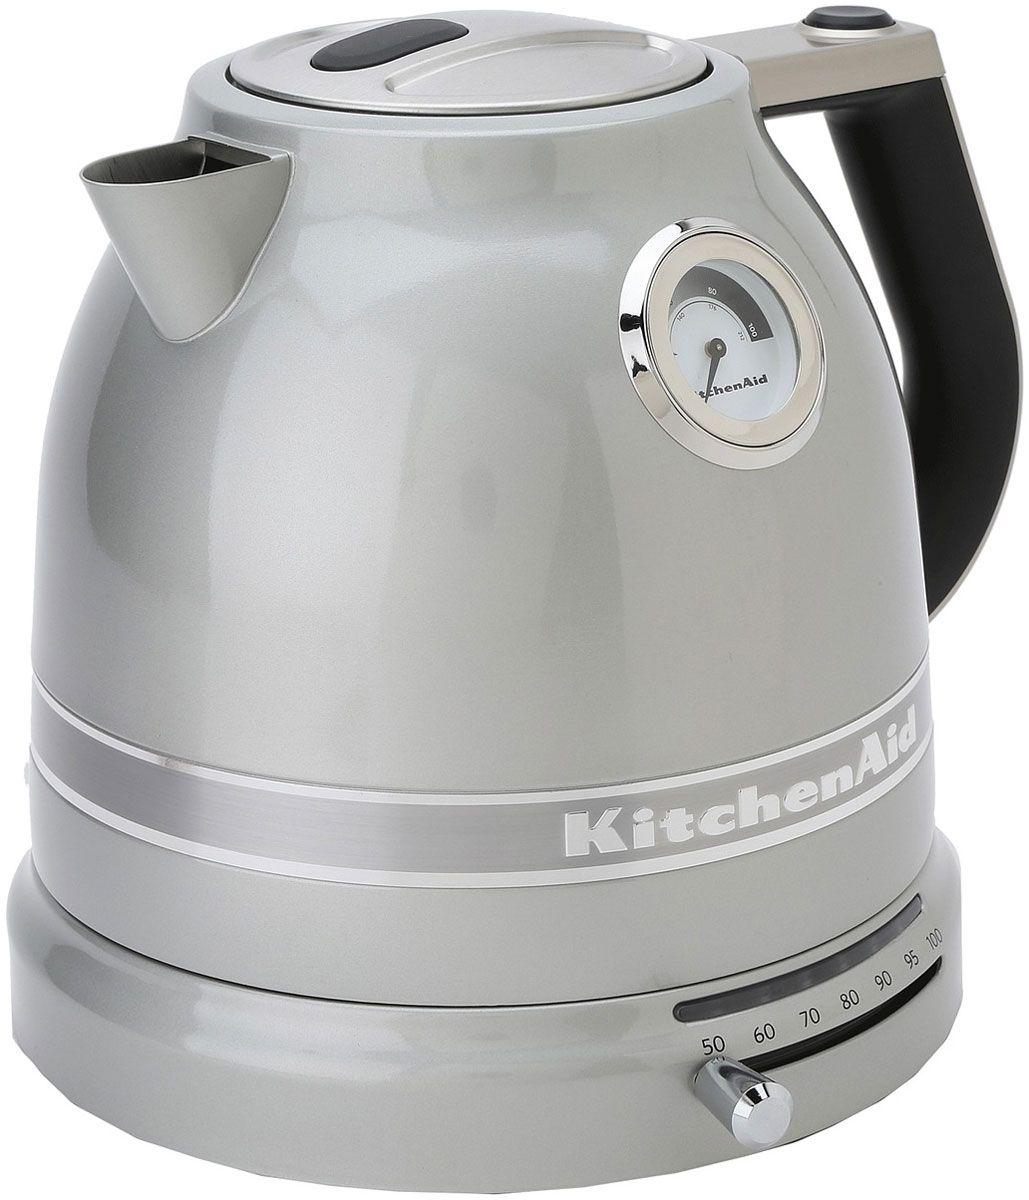 Kitchenaid Pro Line Series Electric Kettle Kek1522sr